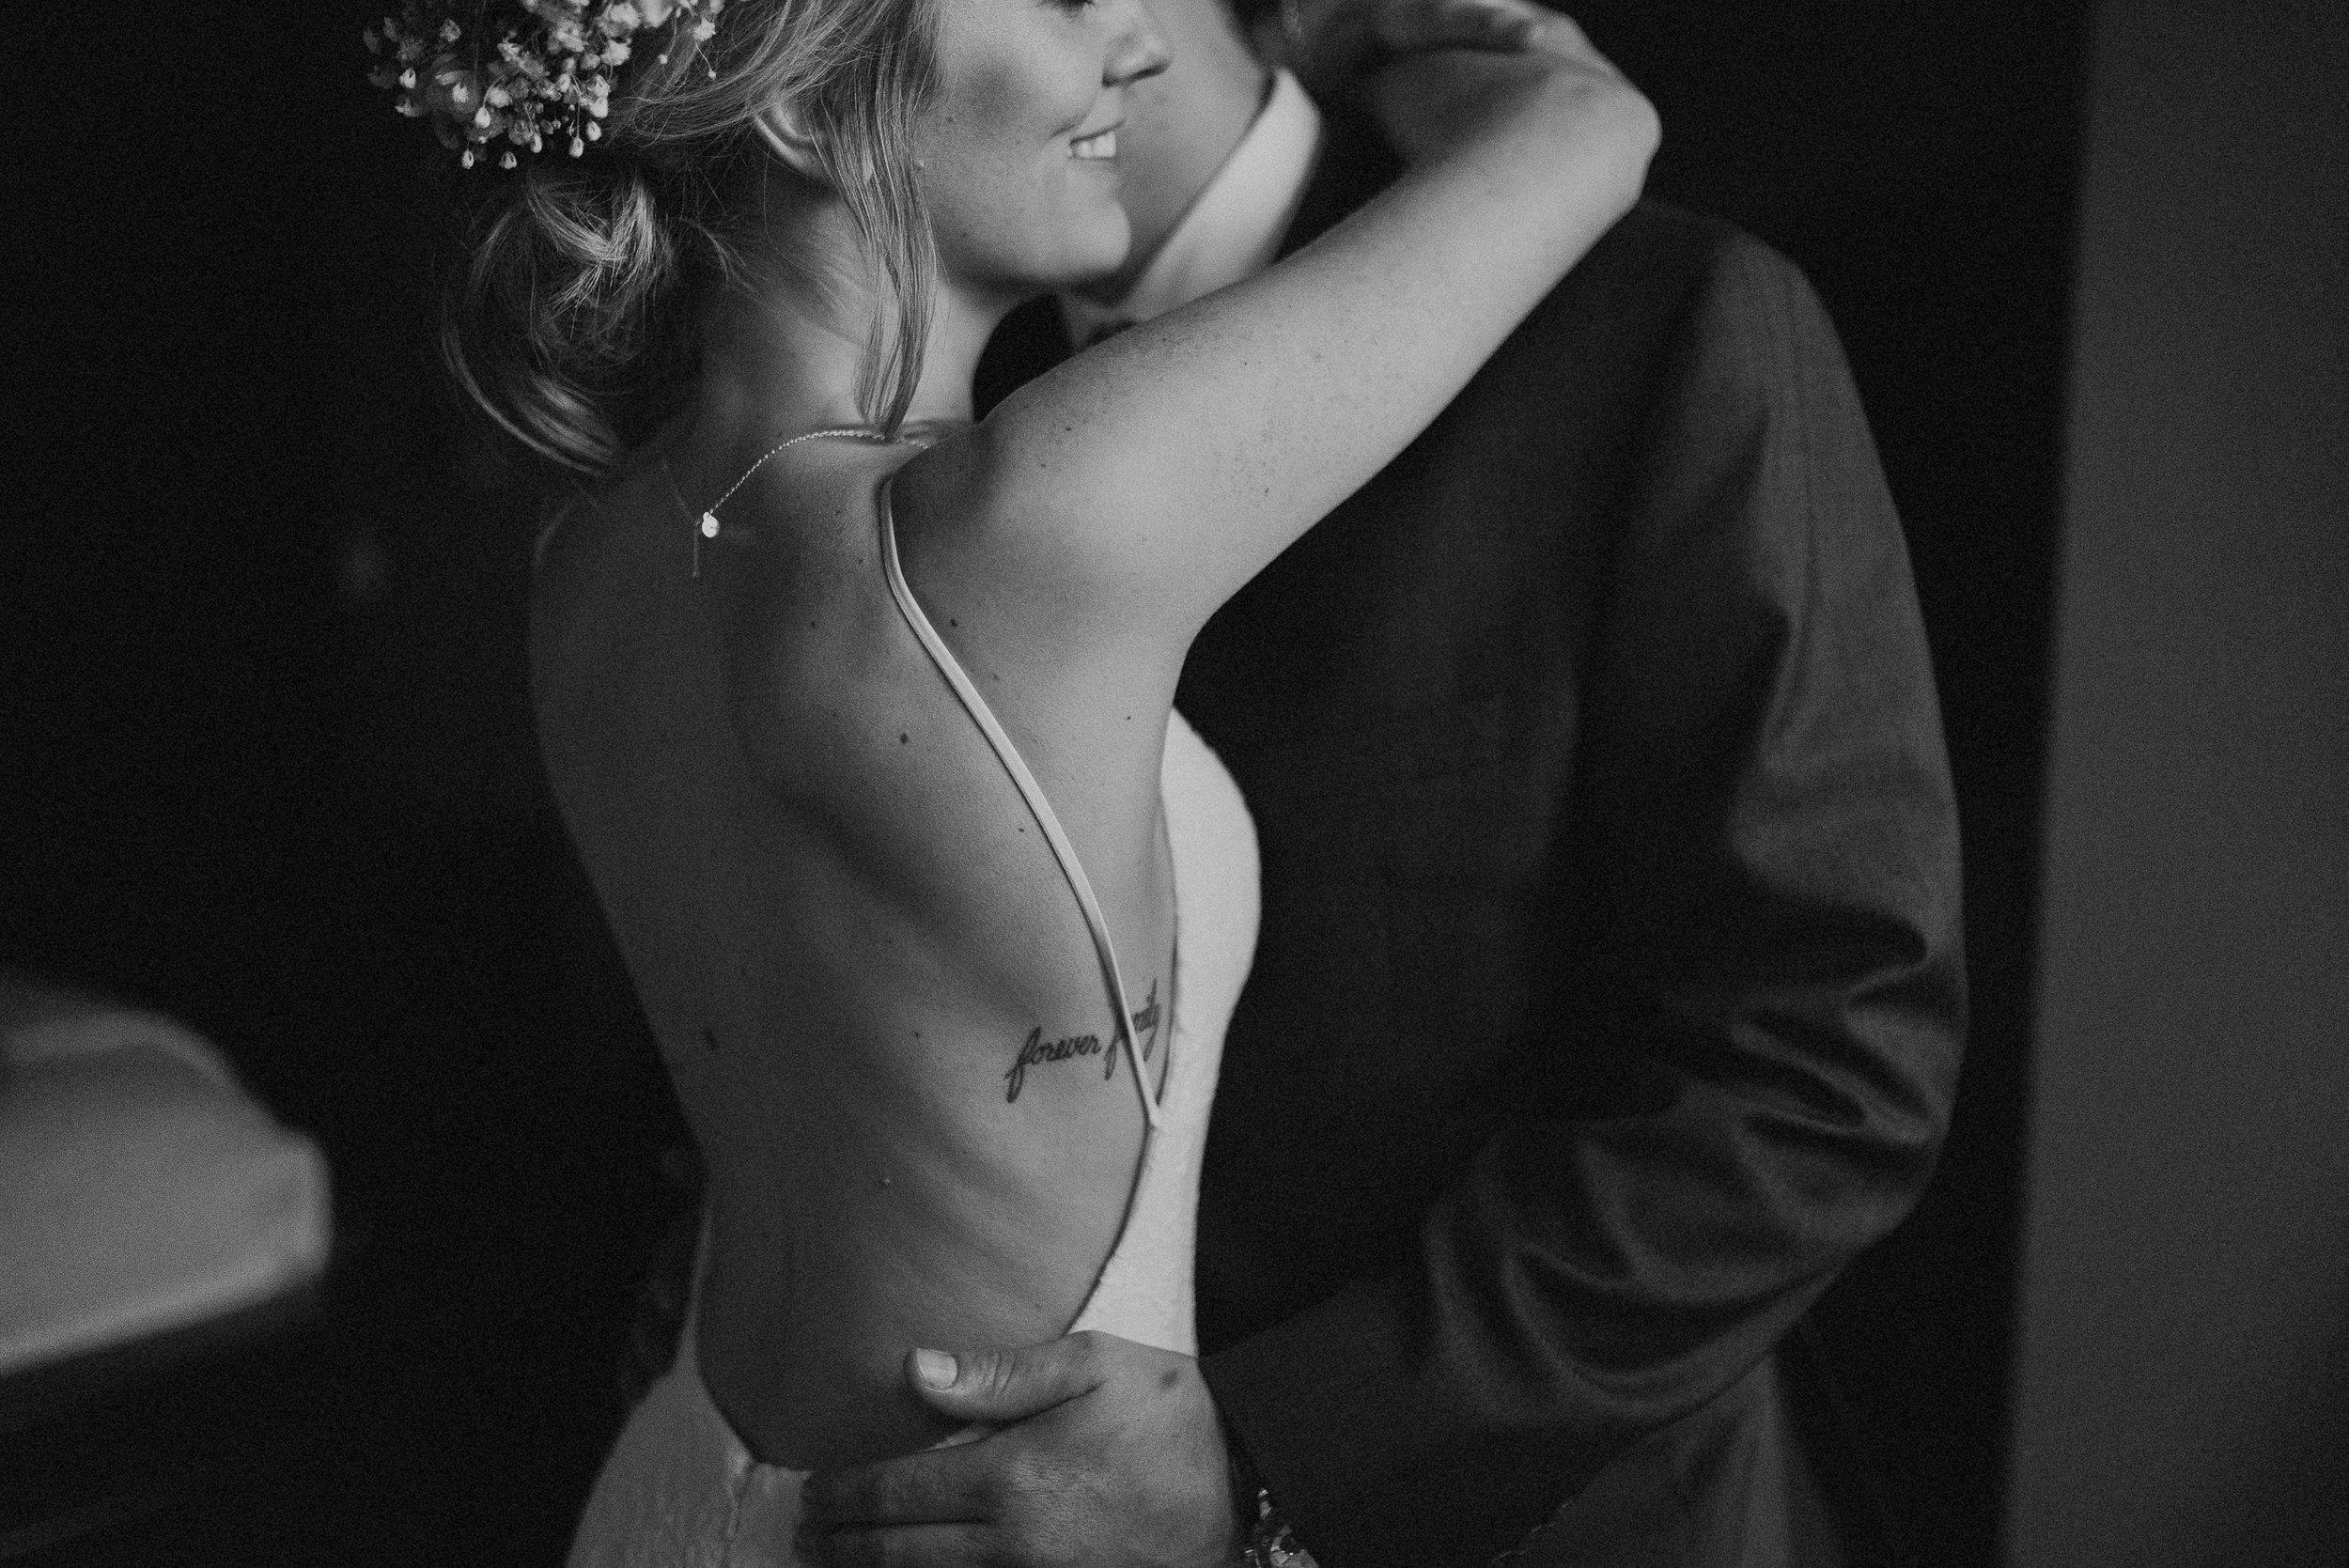 mark-and-liz-wedding-443.jpg